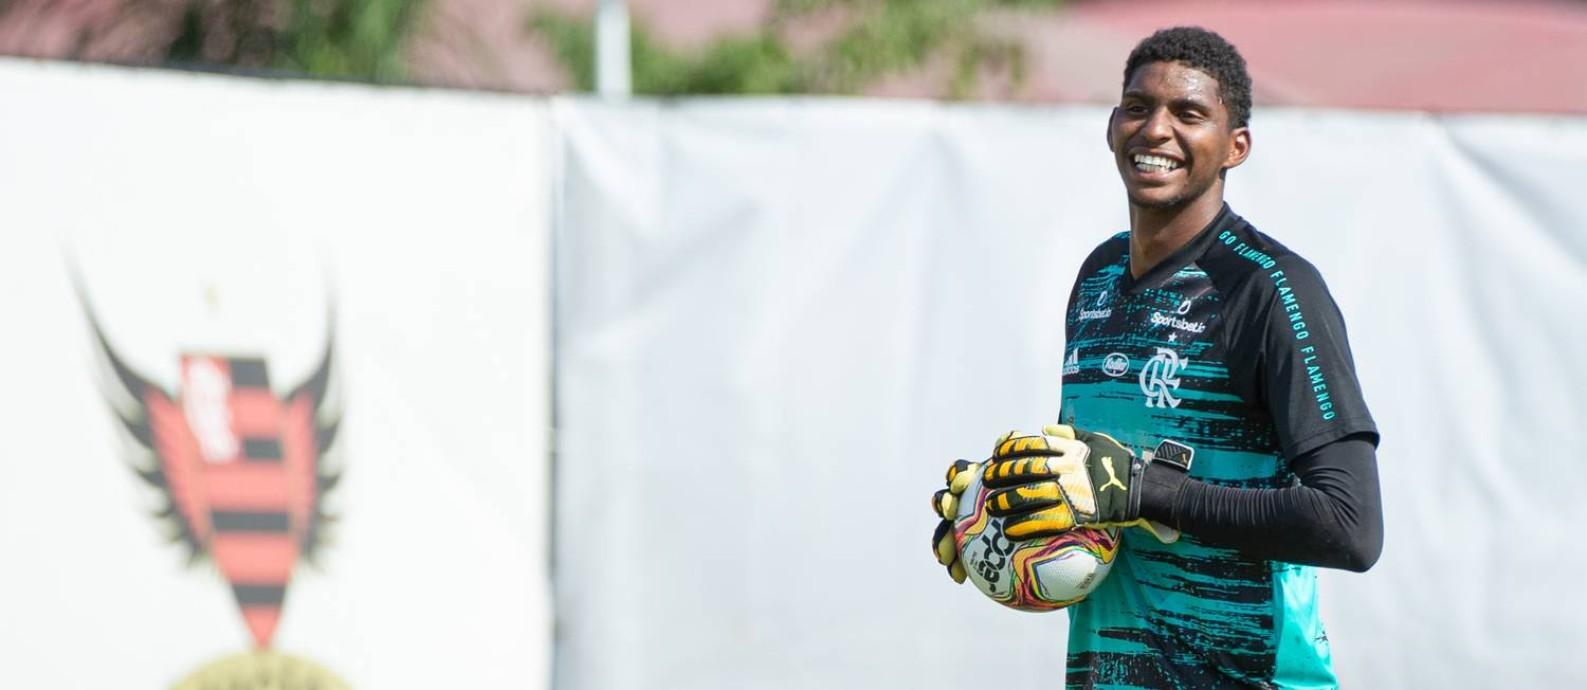 Hugo Souza, goleiro do Flamengo Foto: Alexandre Vidal / Flamengo